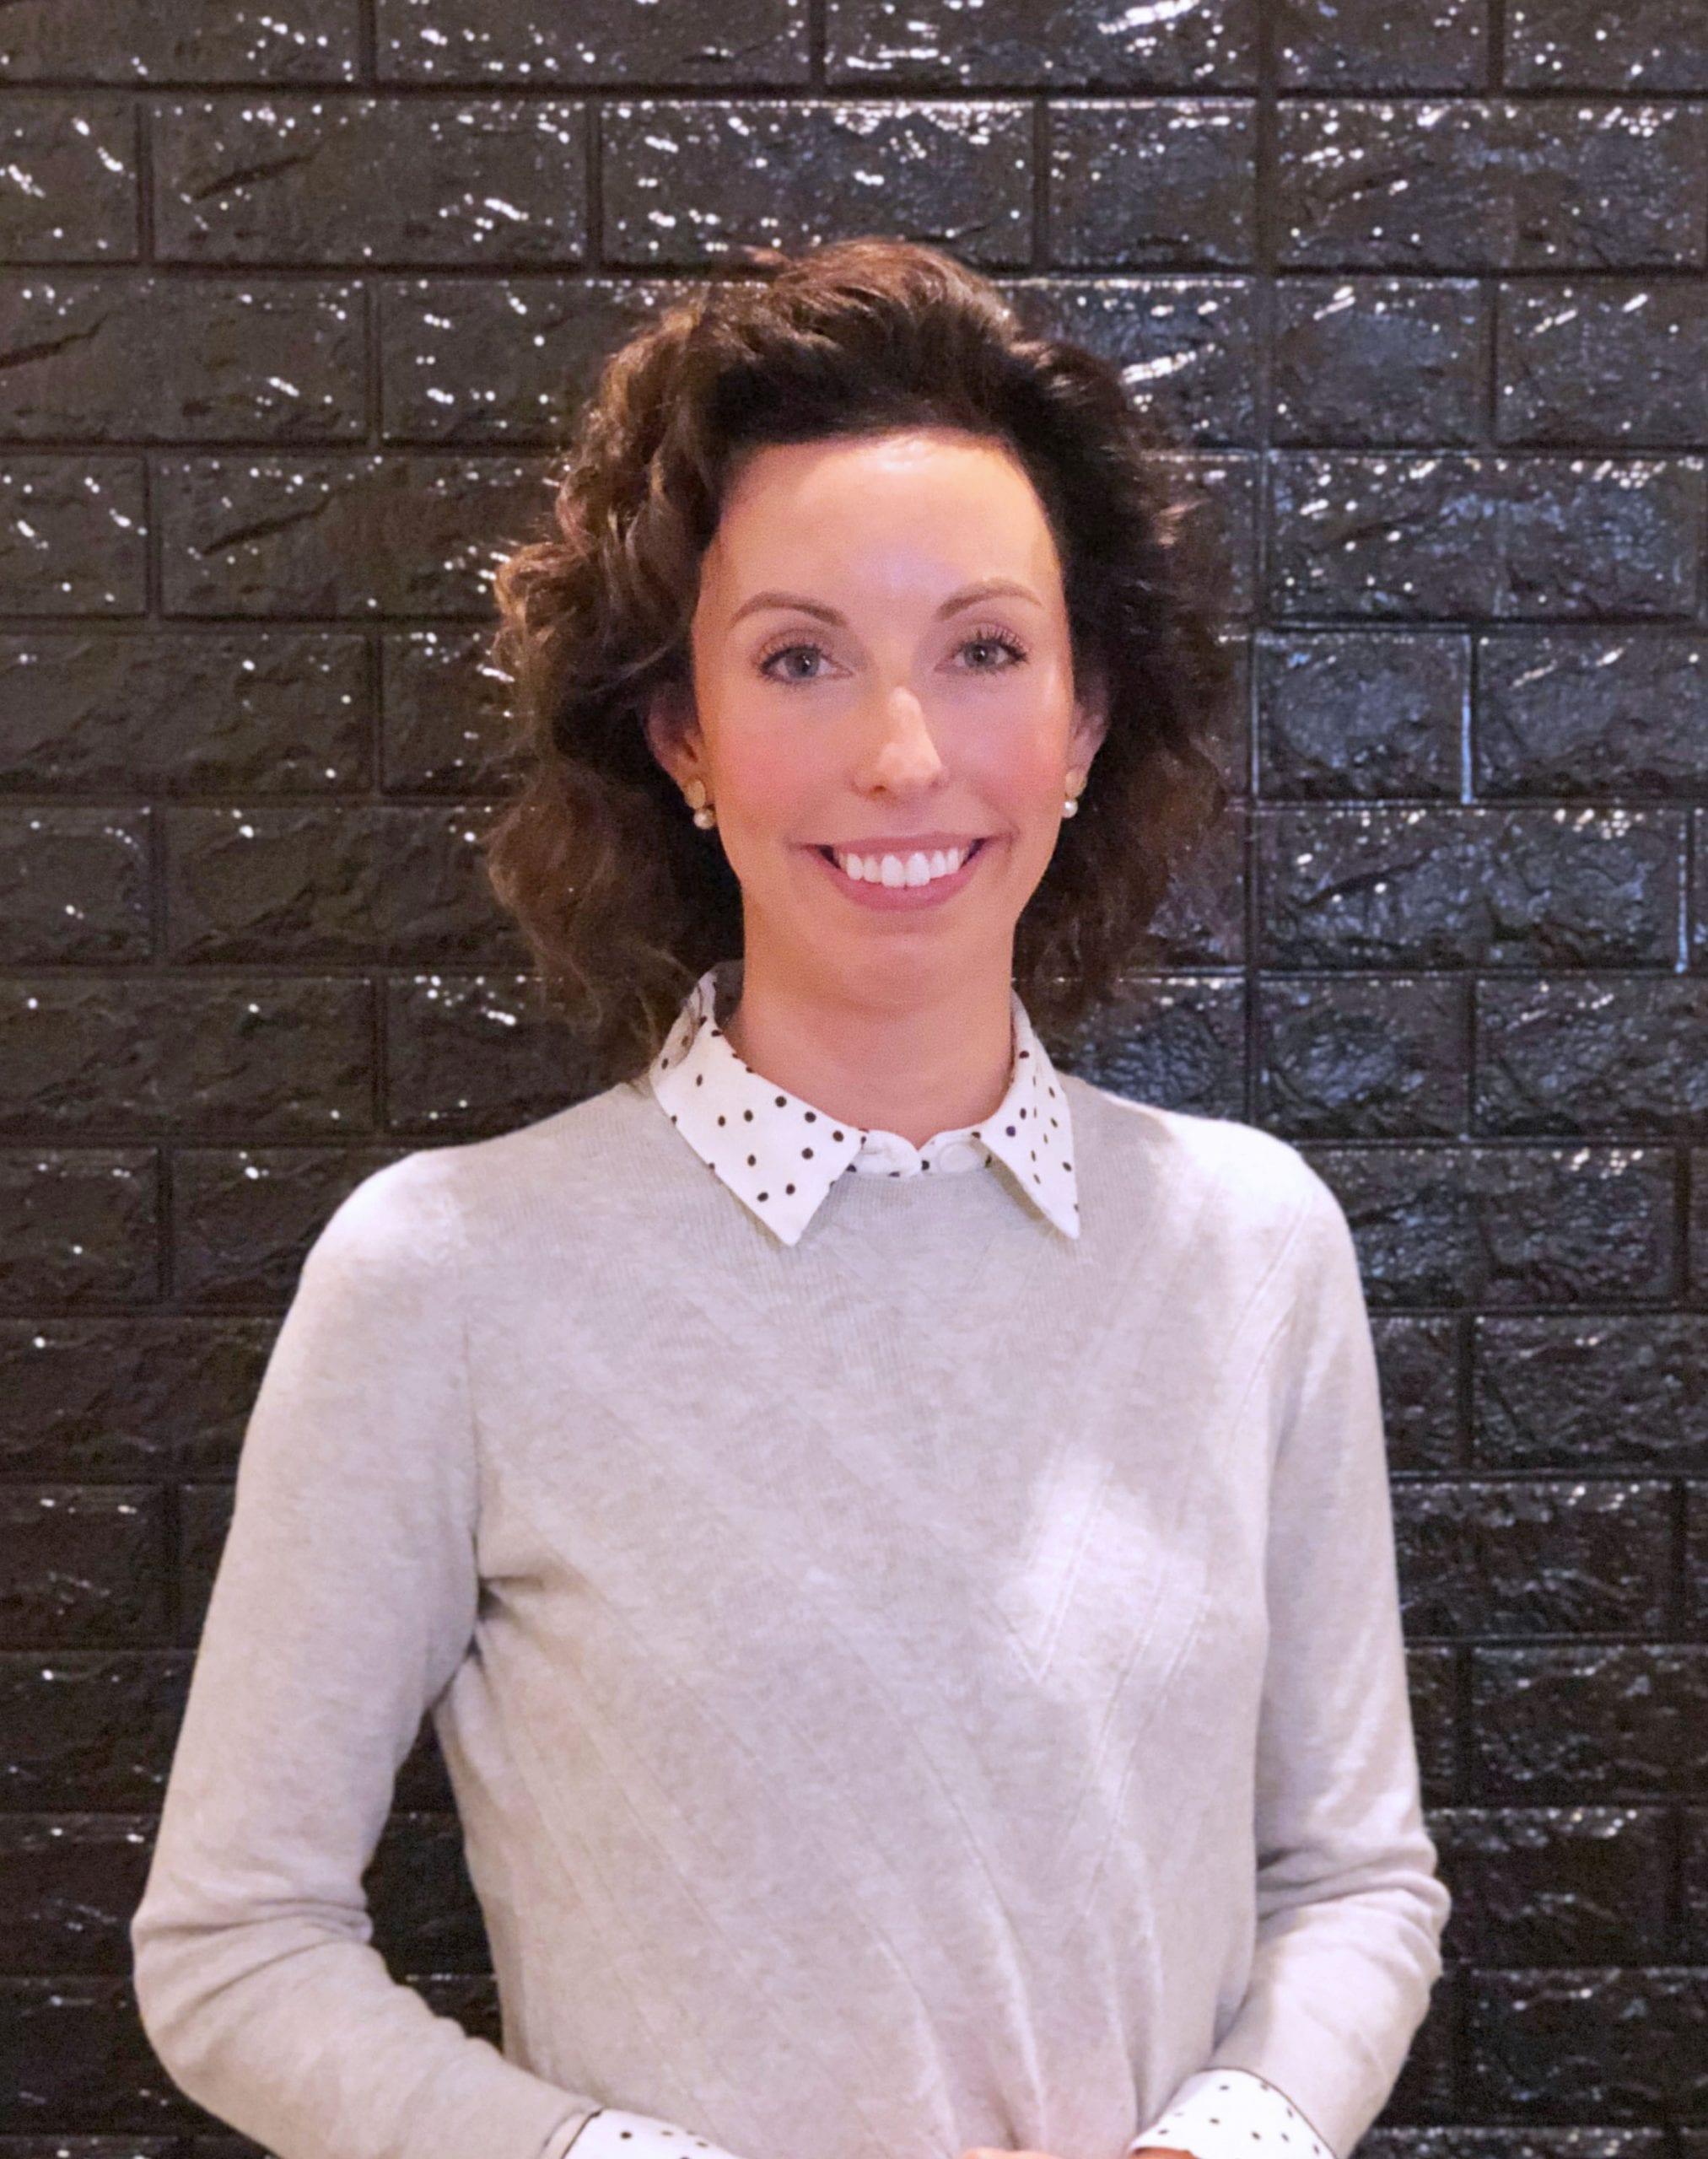 Madison_Barnes Chicago Loop Therapist